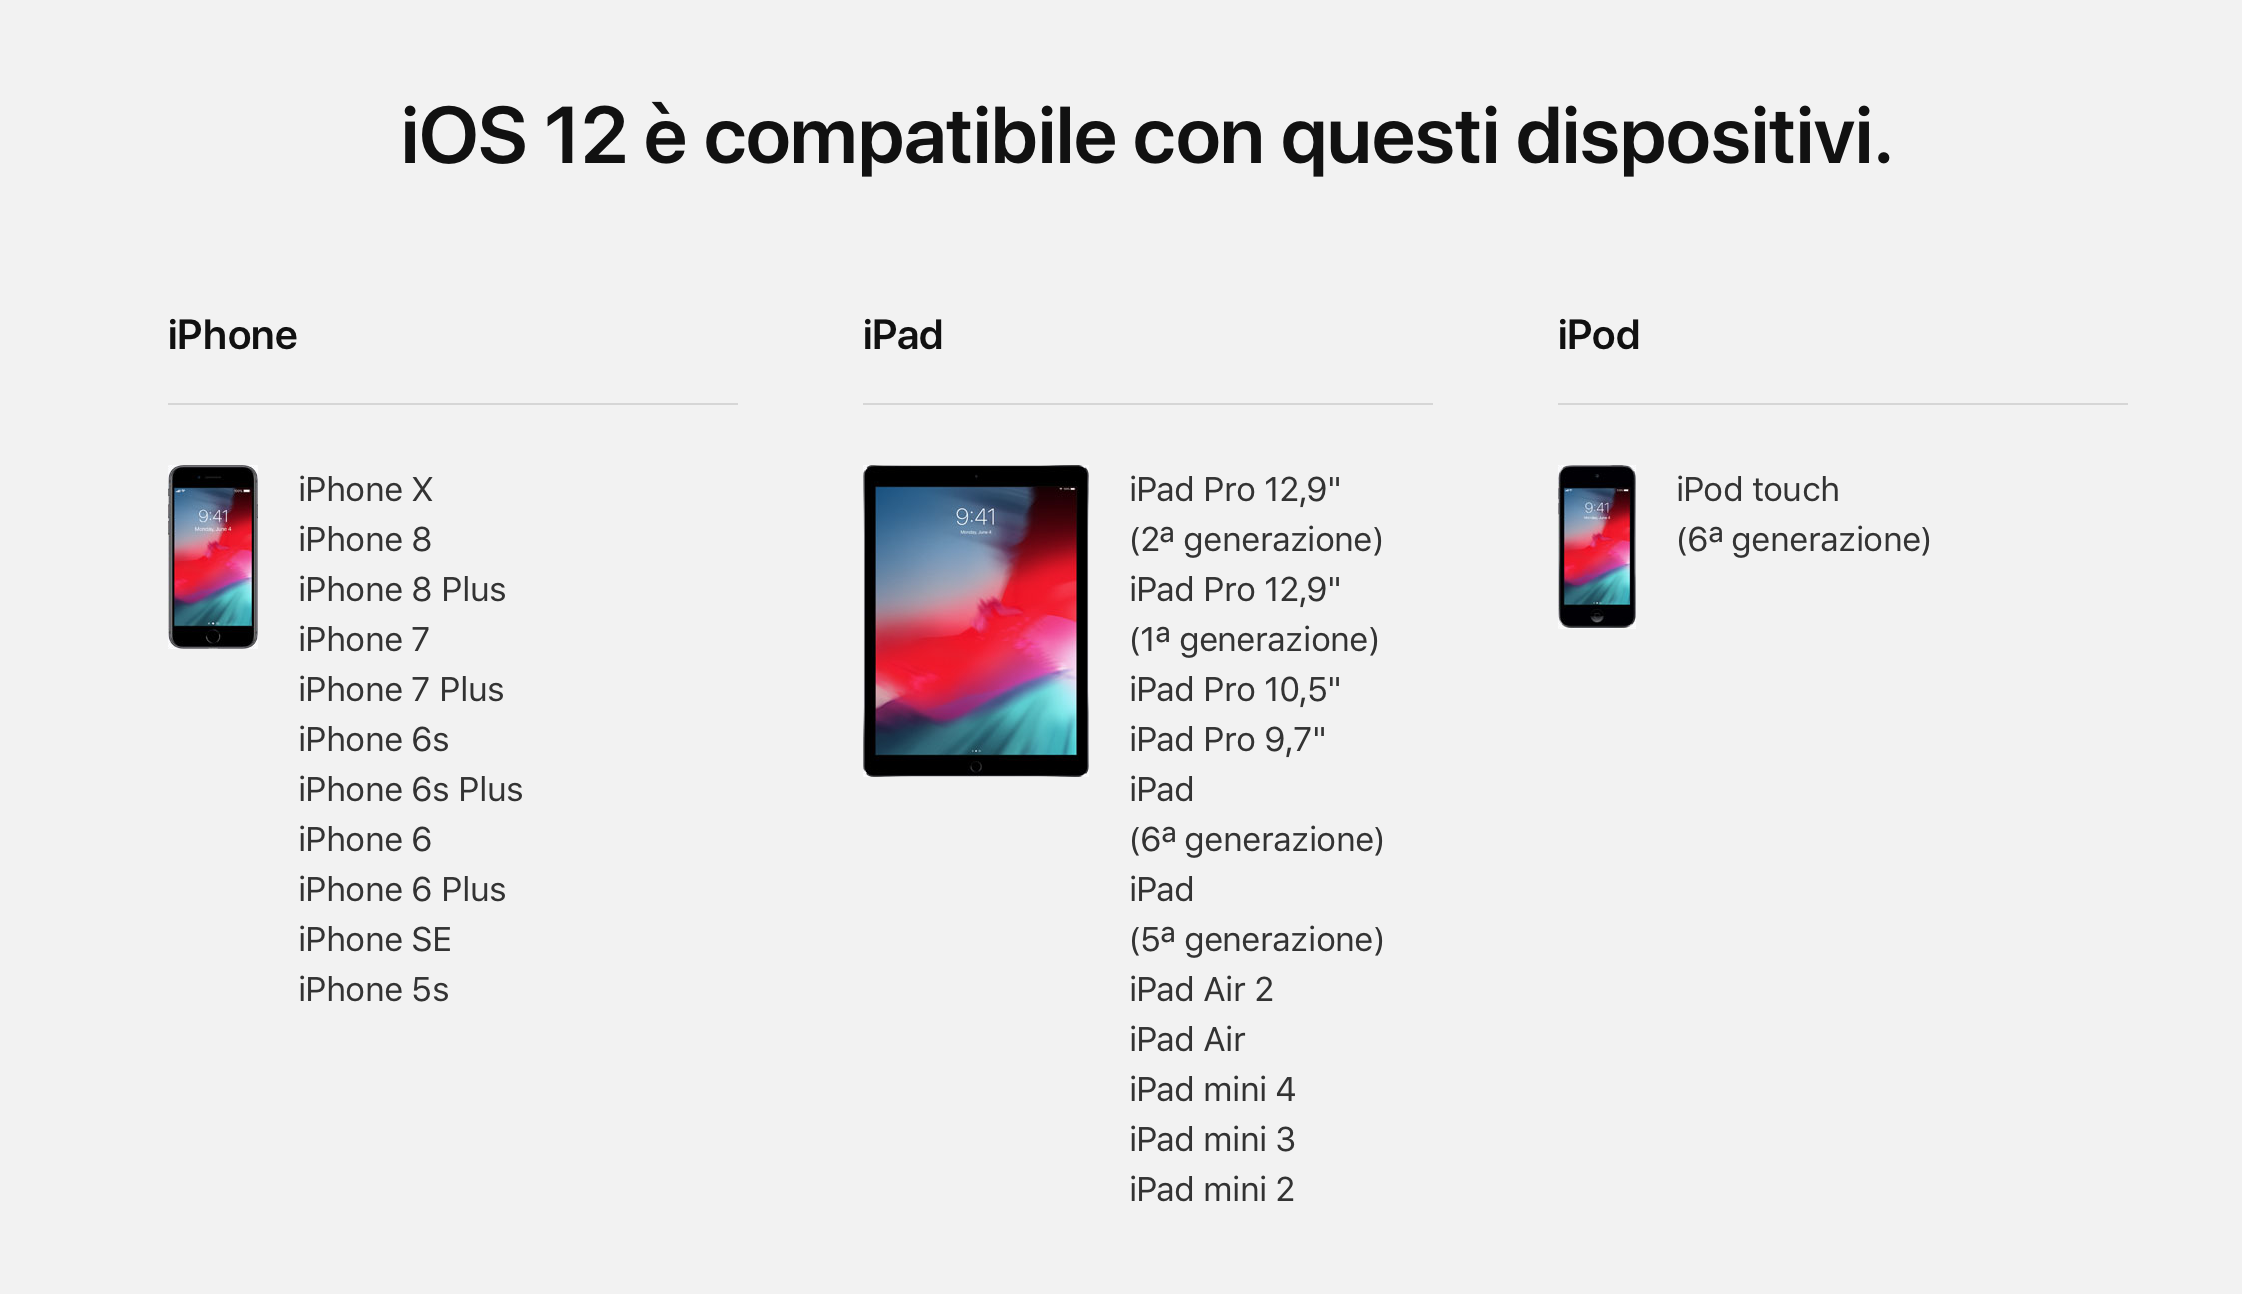 Dispositivi supportati da iOS 12